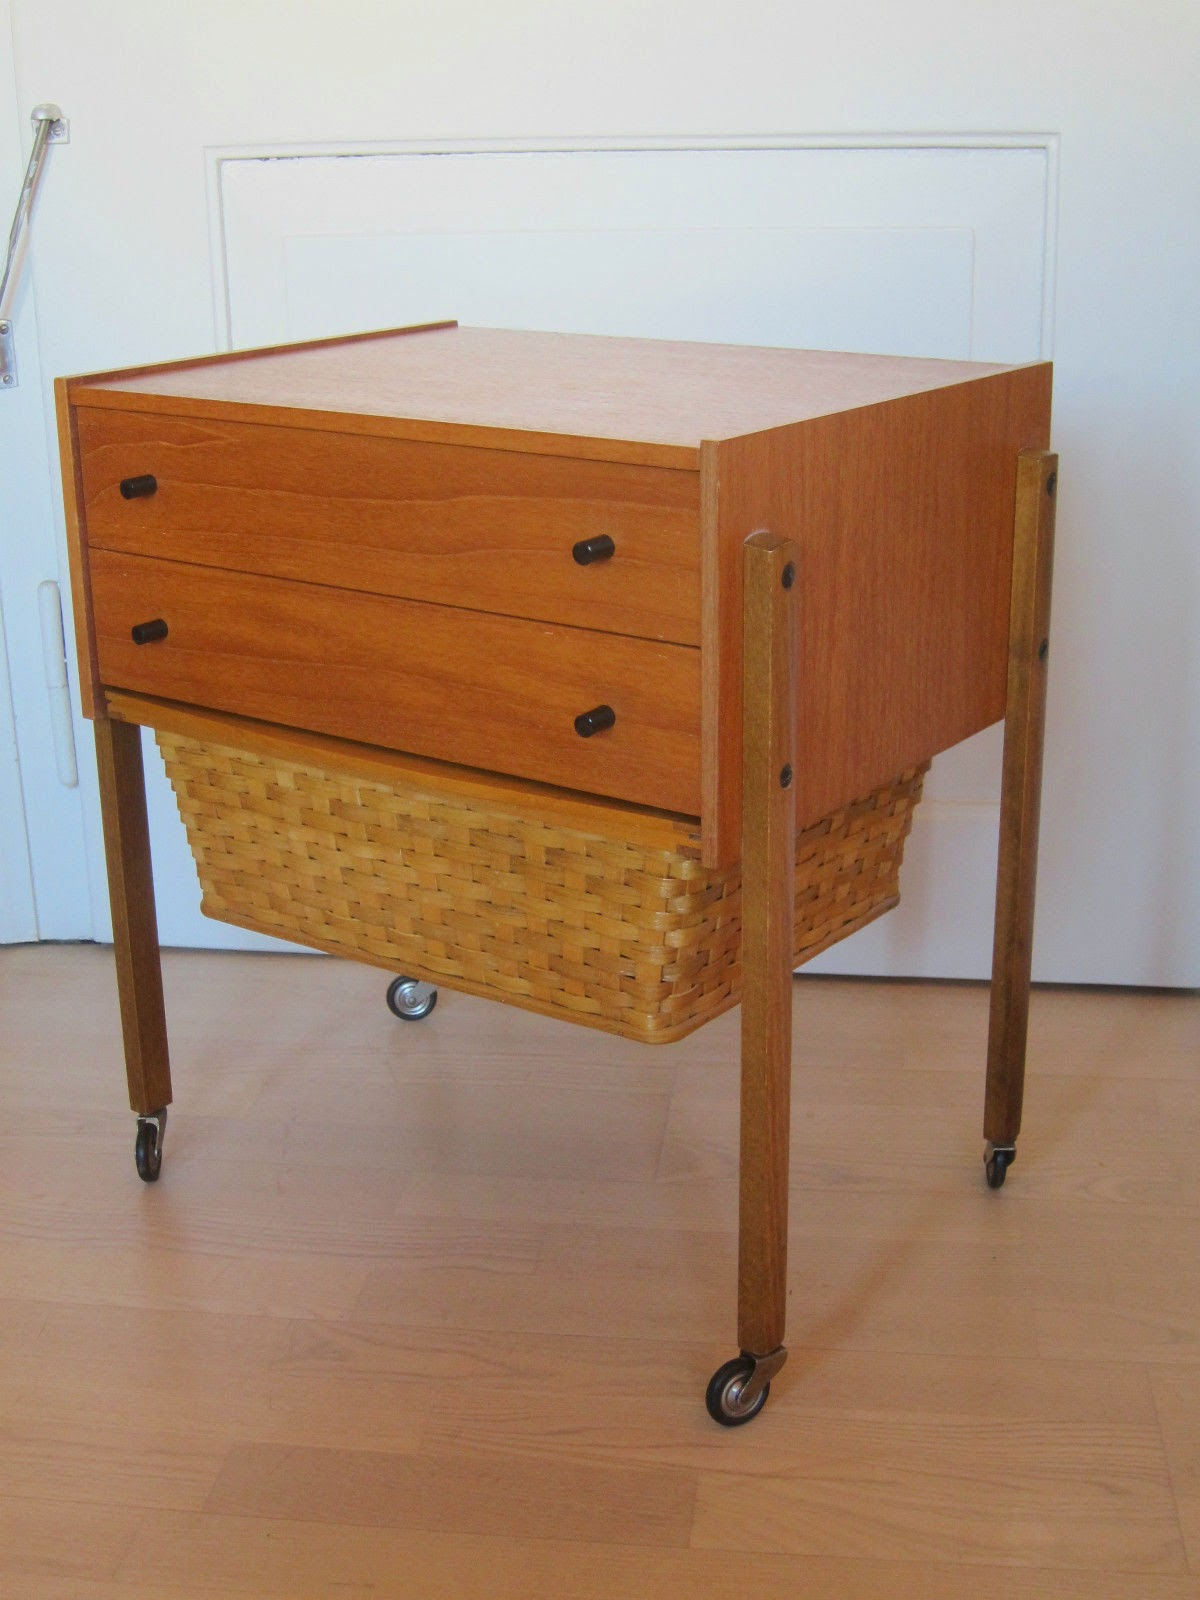 Area vintage dise o mueble auxiliar costurero de los for Muebles diseno vintage